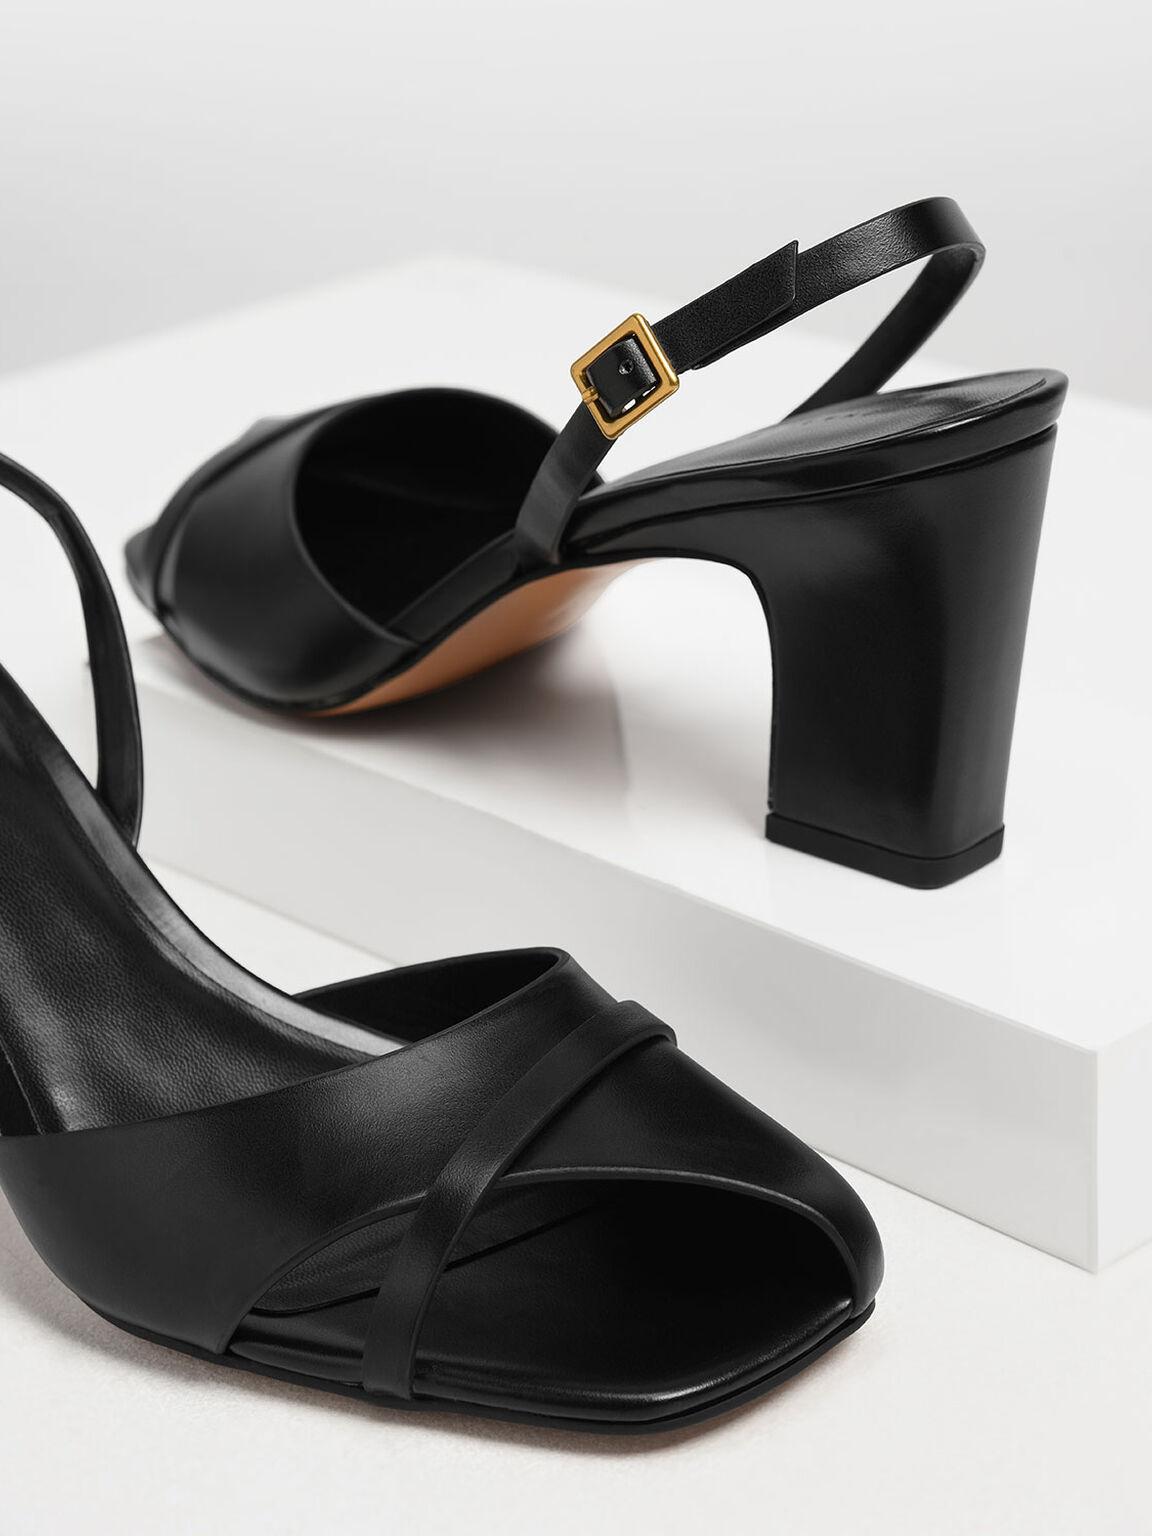 Asymmetrical Peep Toe Heels, Black, hi-res